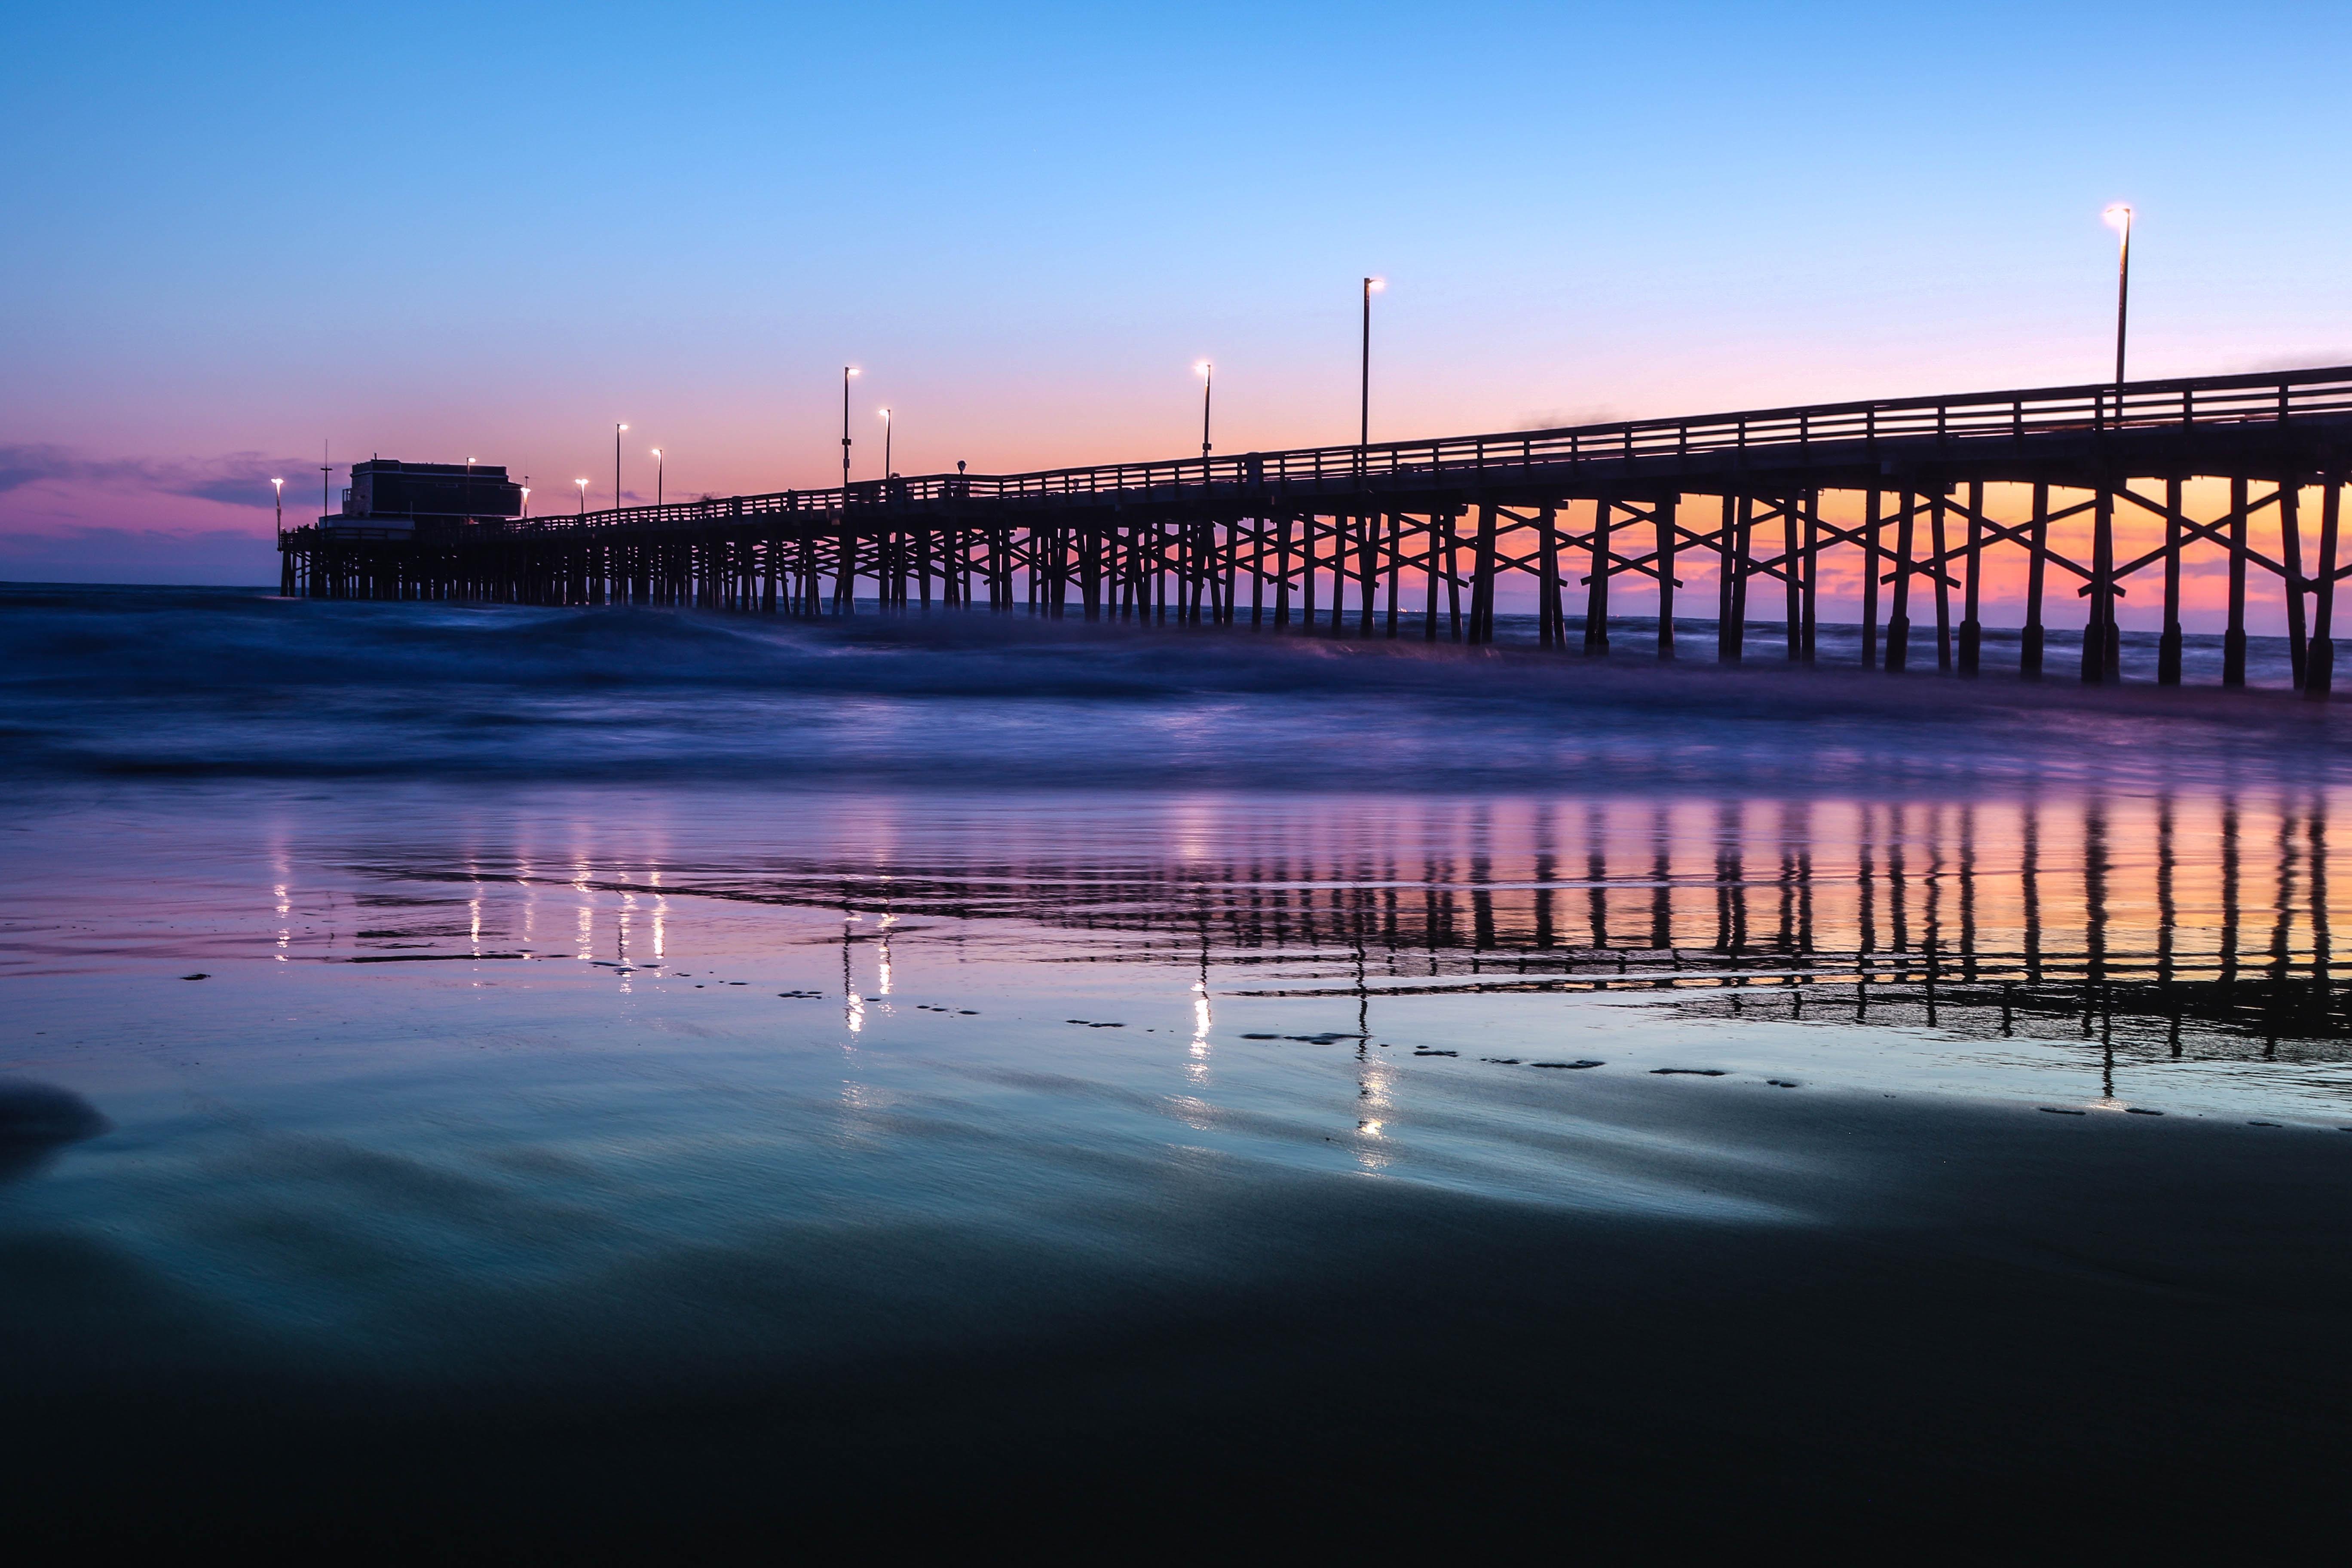 landscape photo of bridge